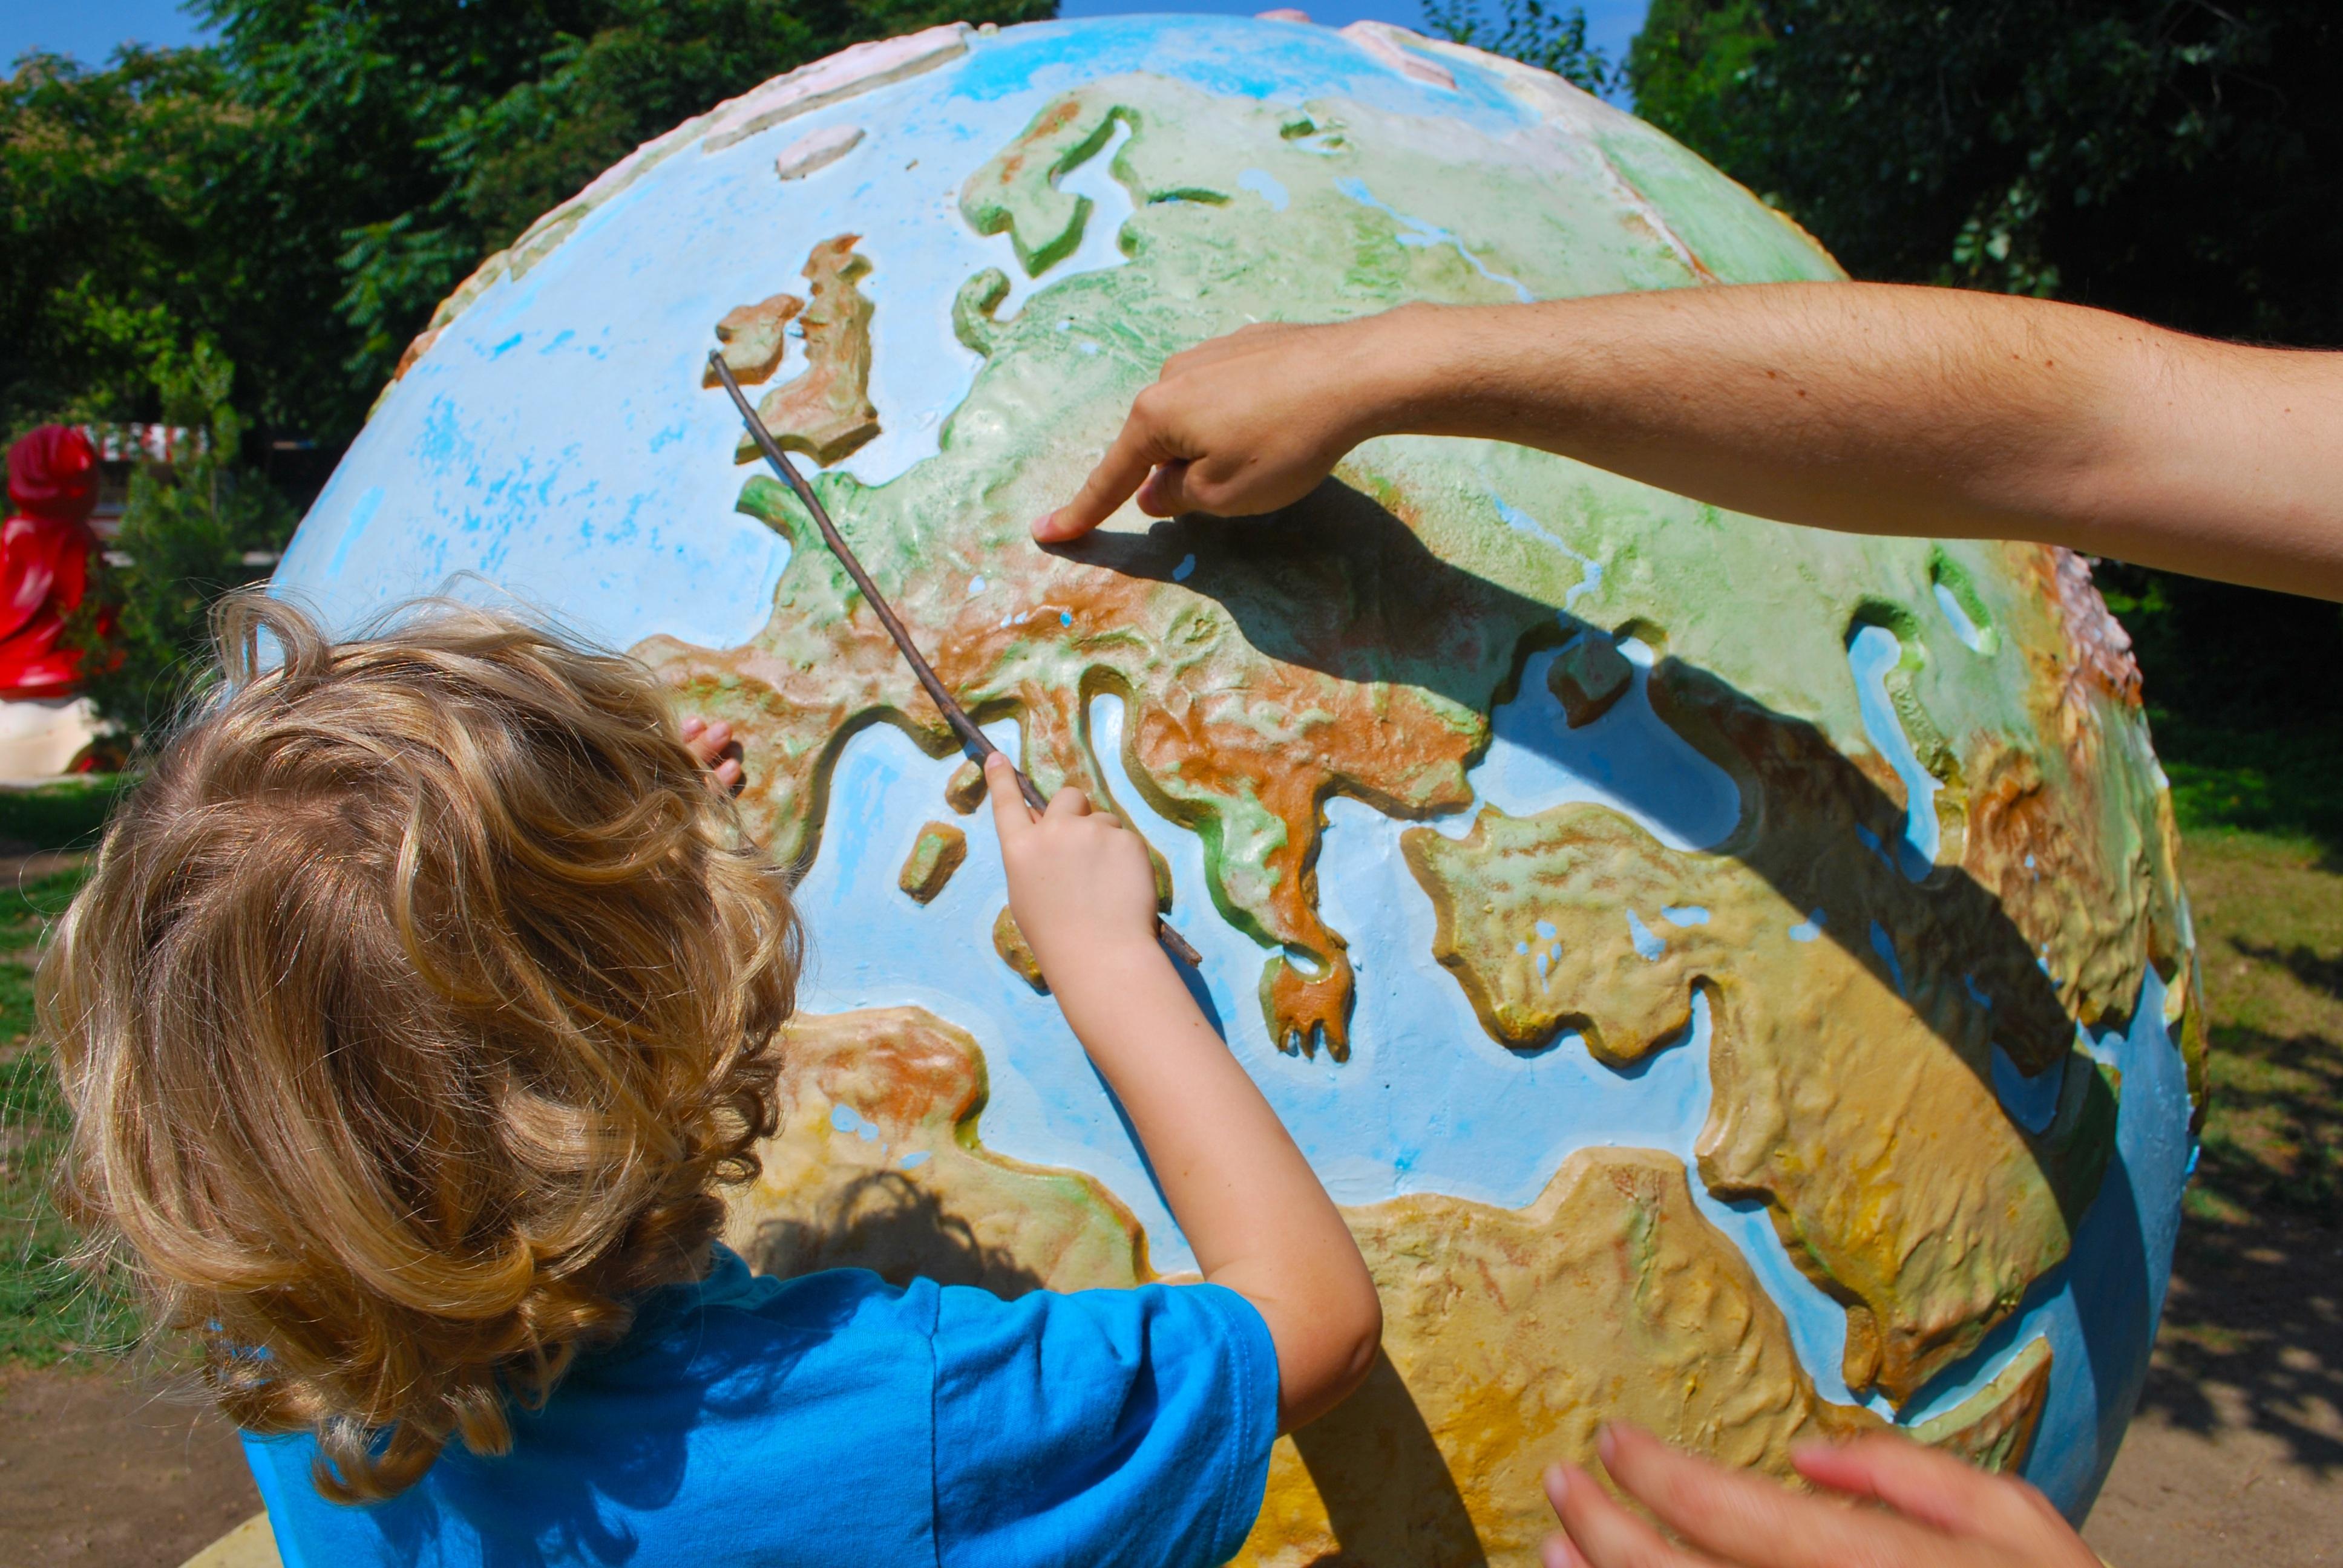 Free Images play travel europe biology child map world